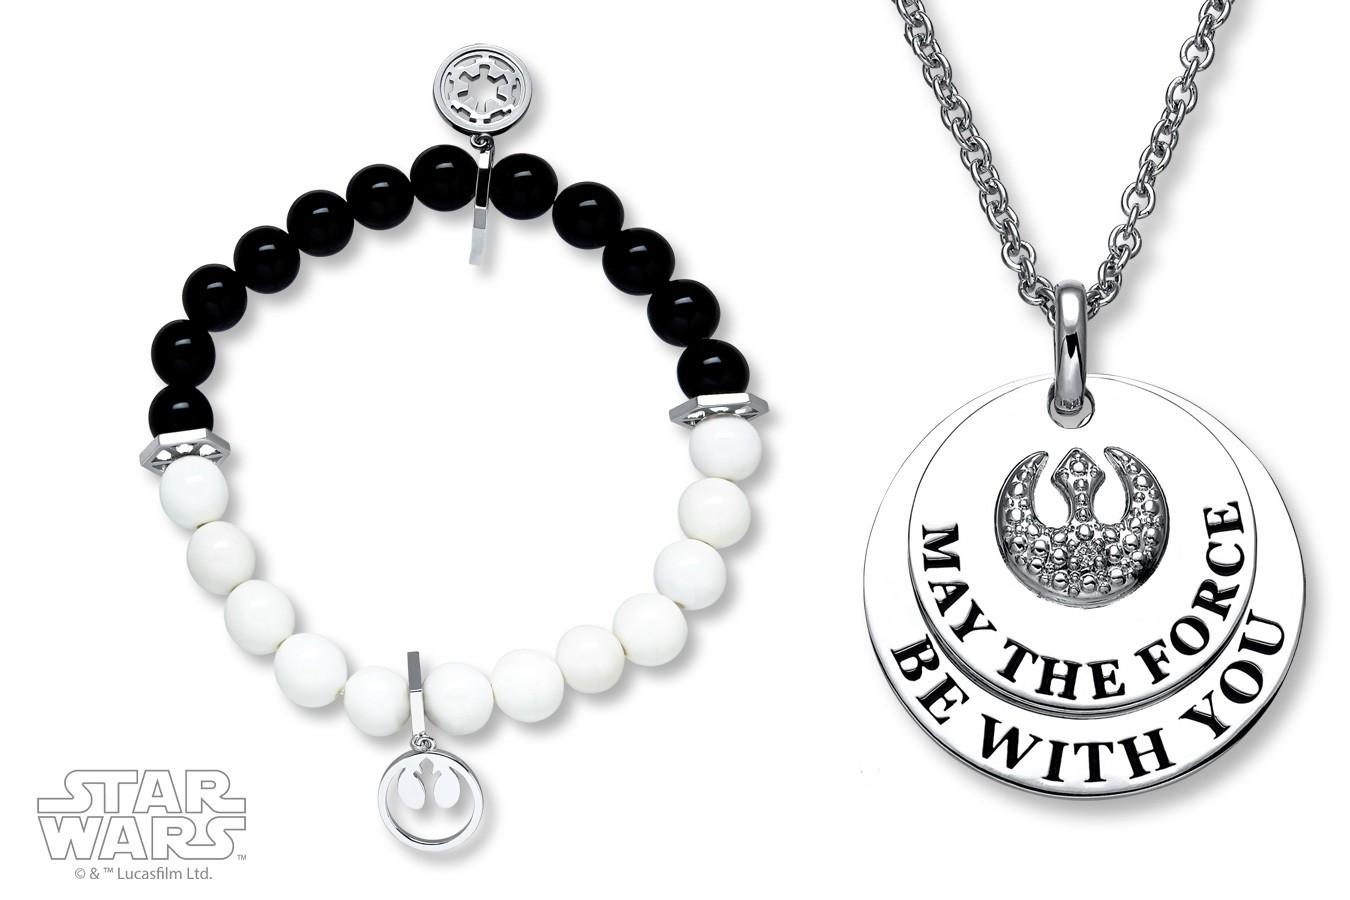 Star Wars Stretch Bracelet Agate/Onyx Sterling Silver EANadmmznb